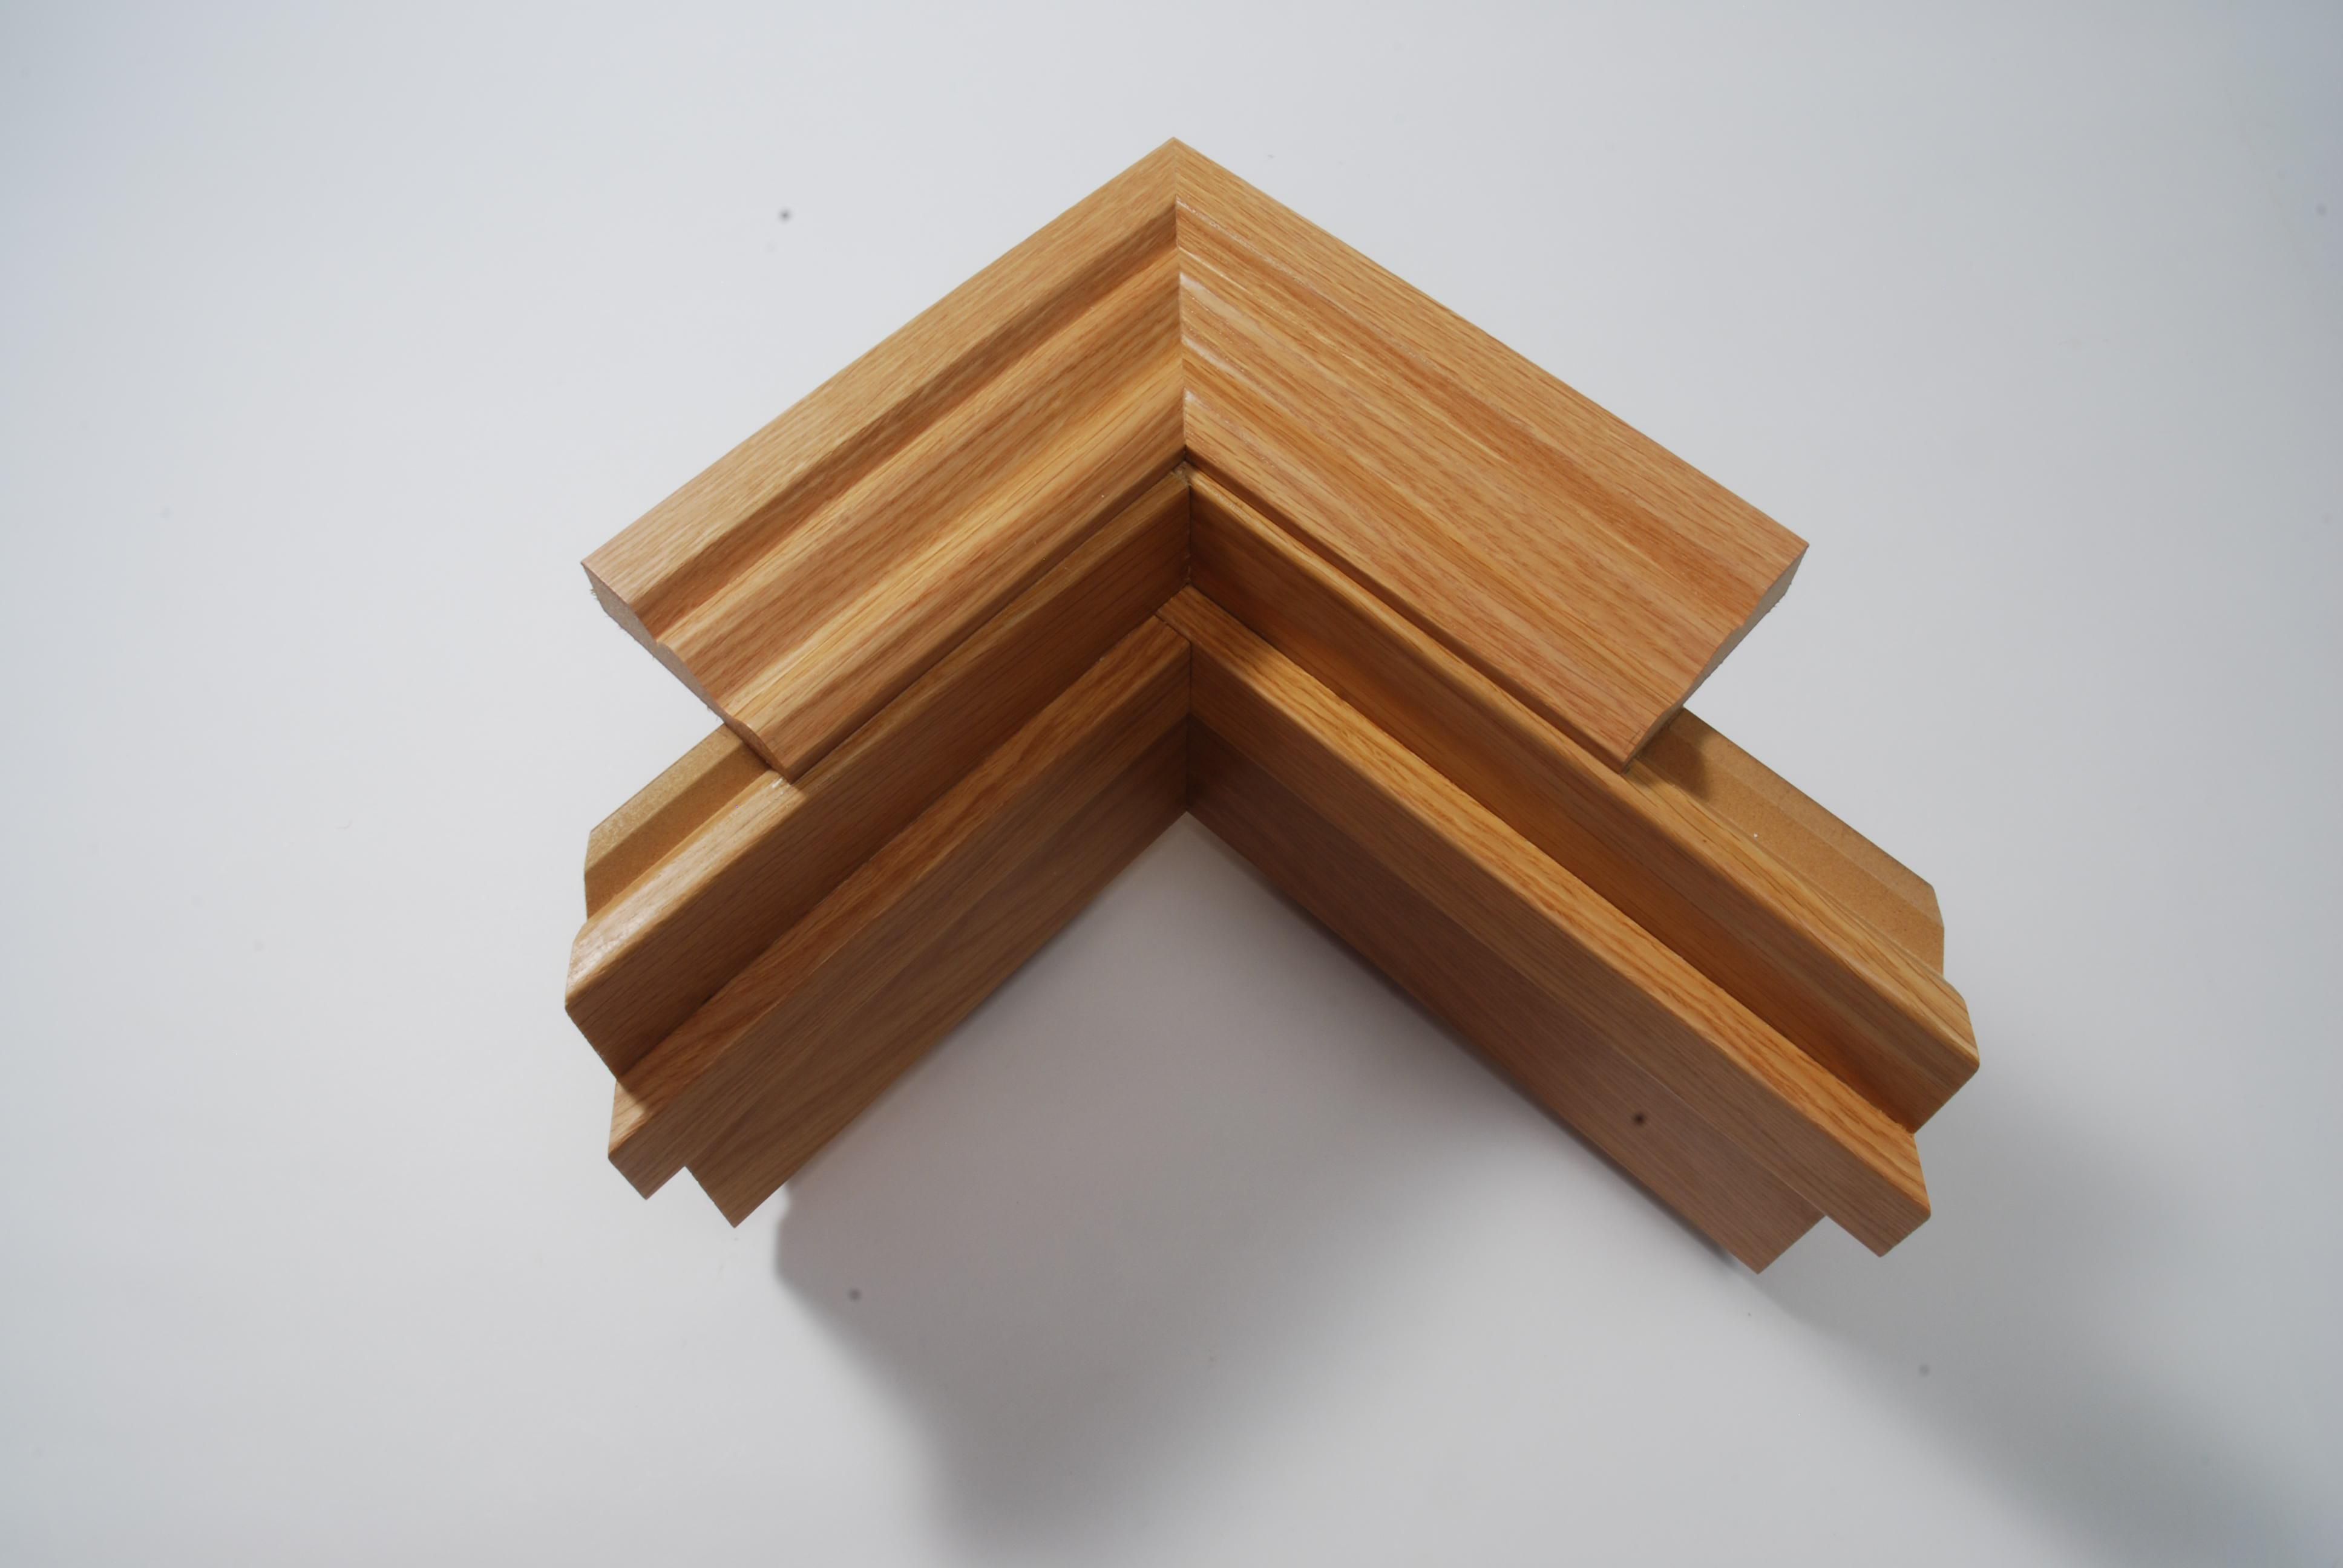 Fire Fully Adjustable Door Lining Set 30mm x 88 - 155mm Veneered American White Oak (Special Offer)